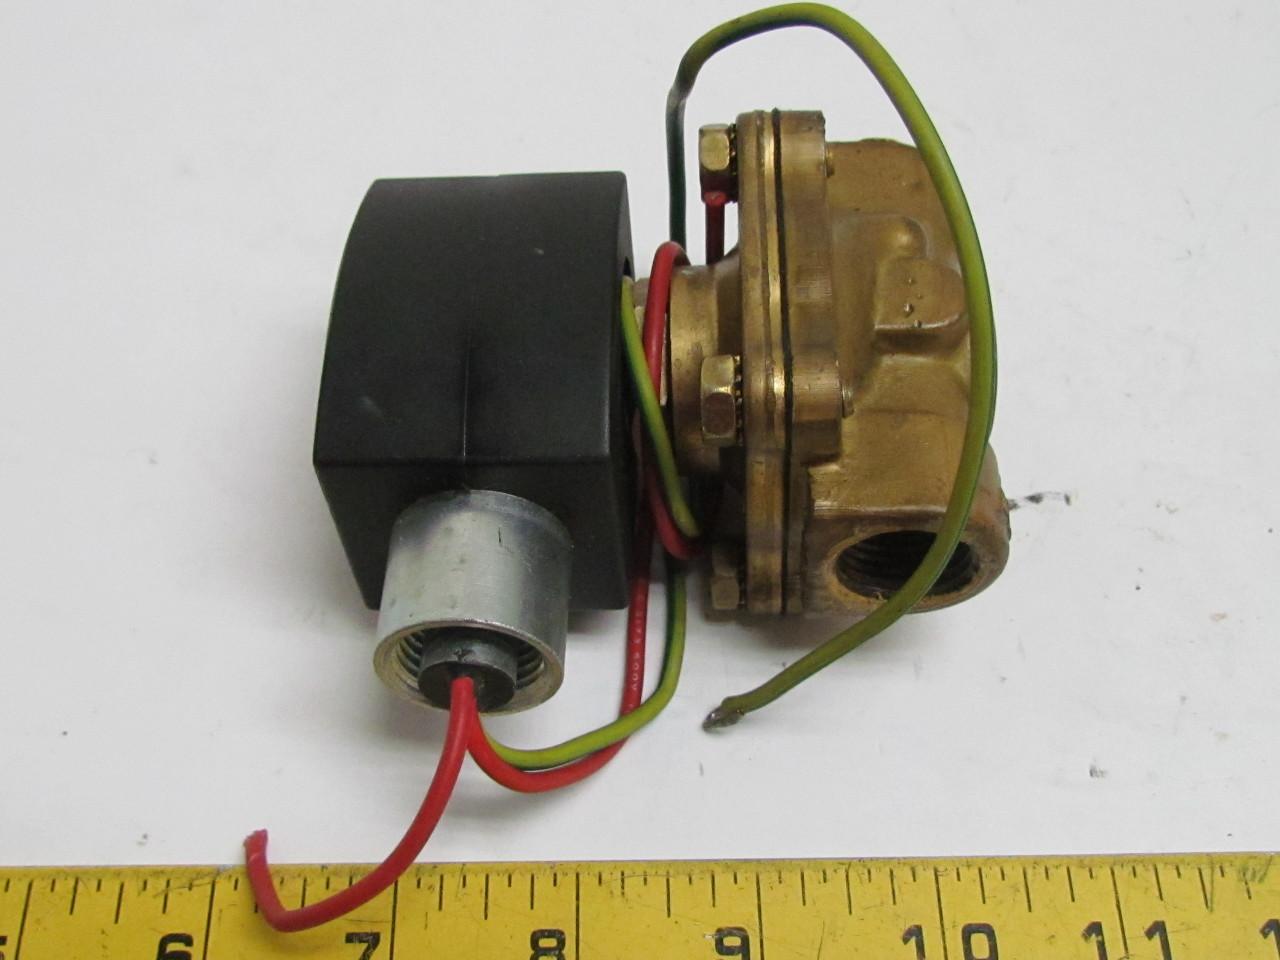 asco red hat wiring diagram kia rio 2005 stereo hayward pool motor 120 volt free engine